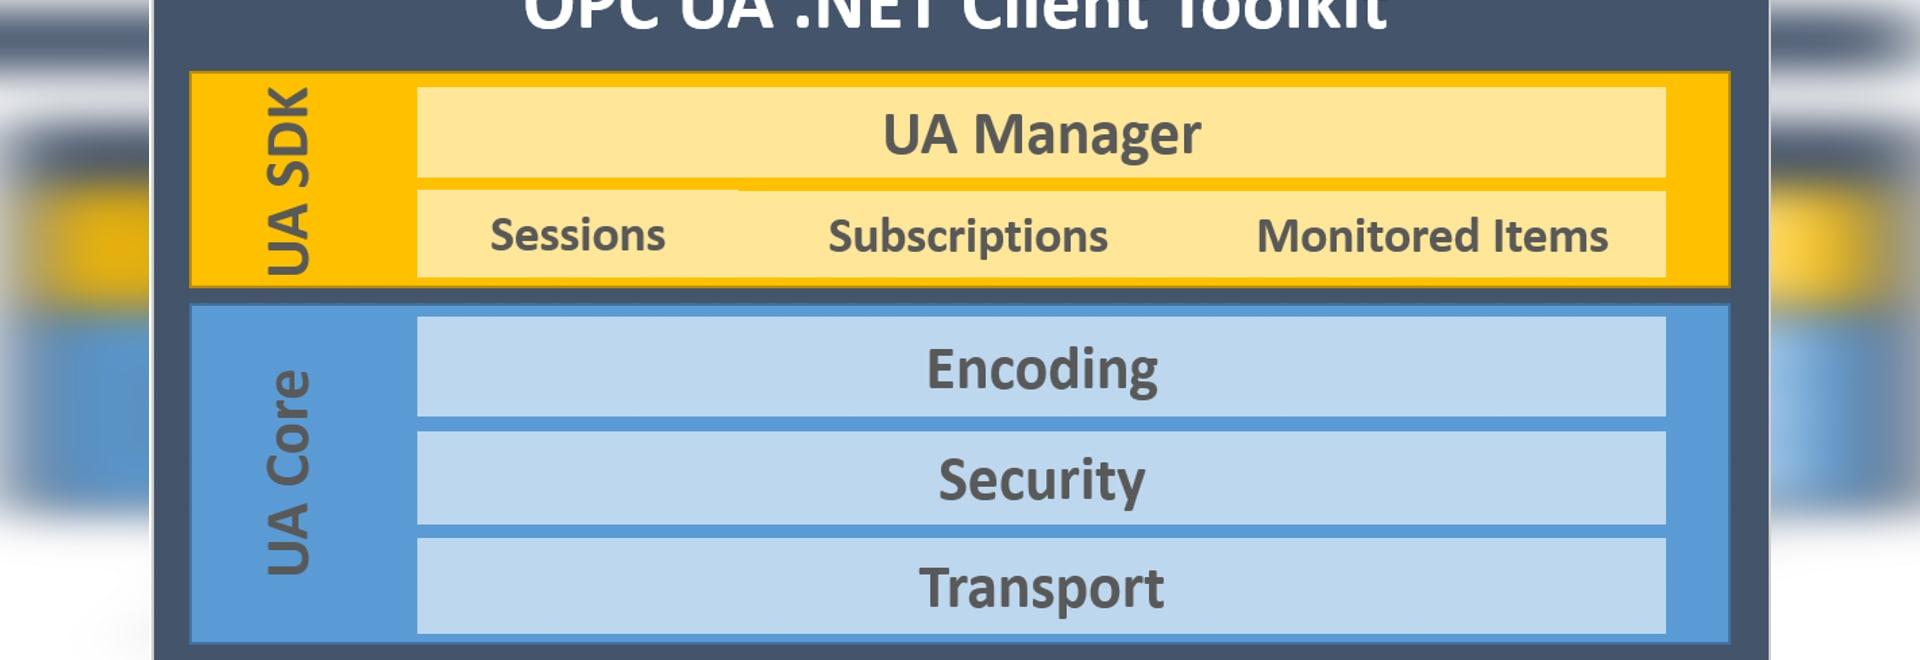 Integration Objects' OPC UA Latest Release - Houston, TX, USA